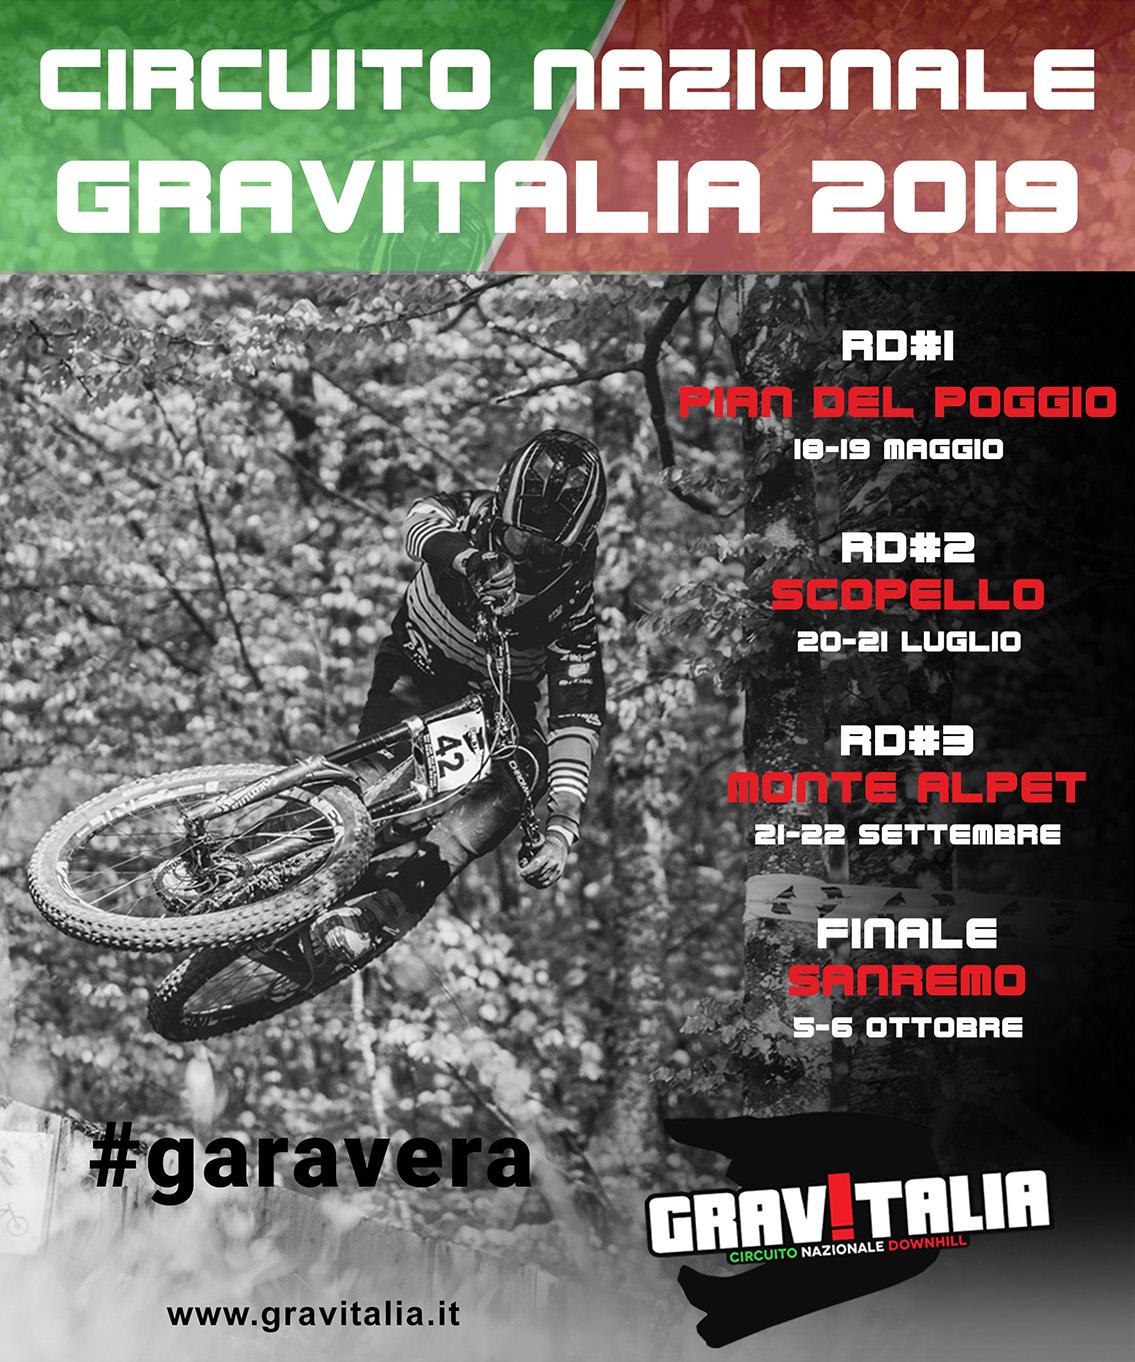 calendario_gravitalia_2019_1135